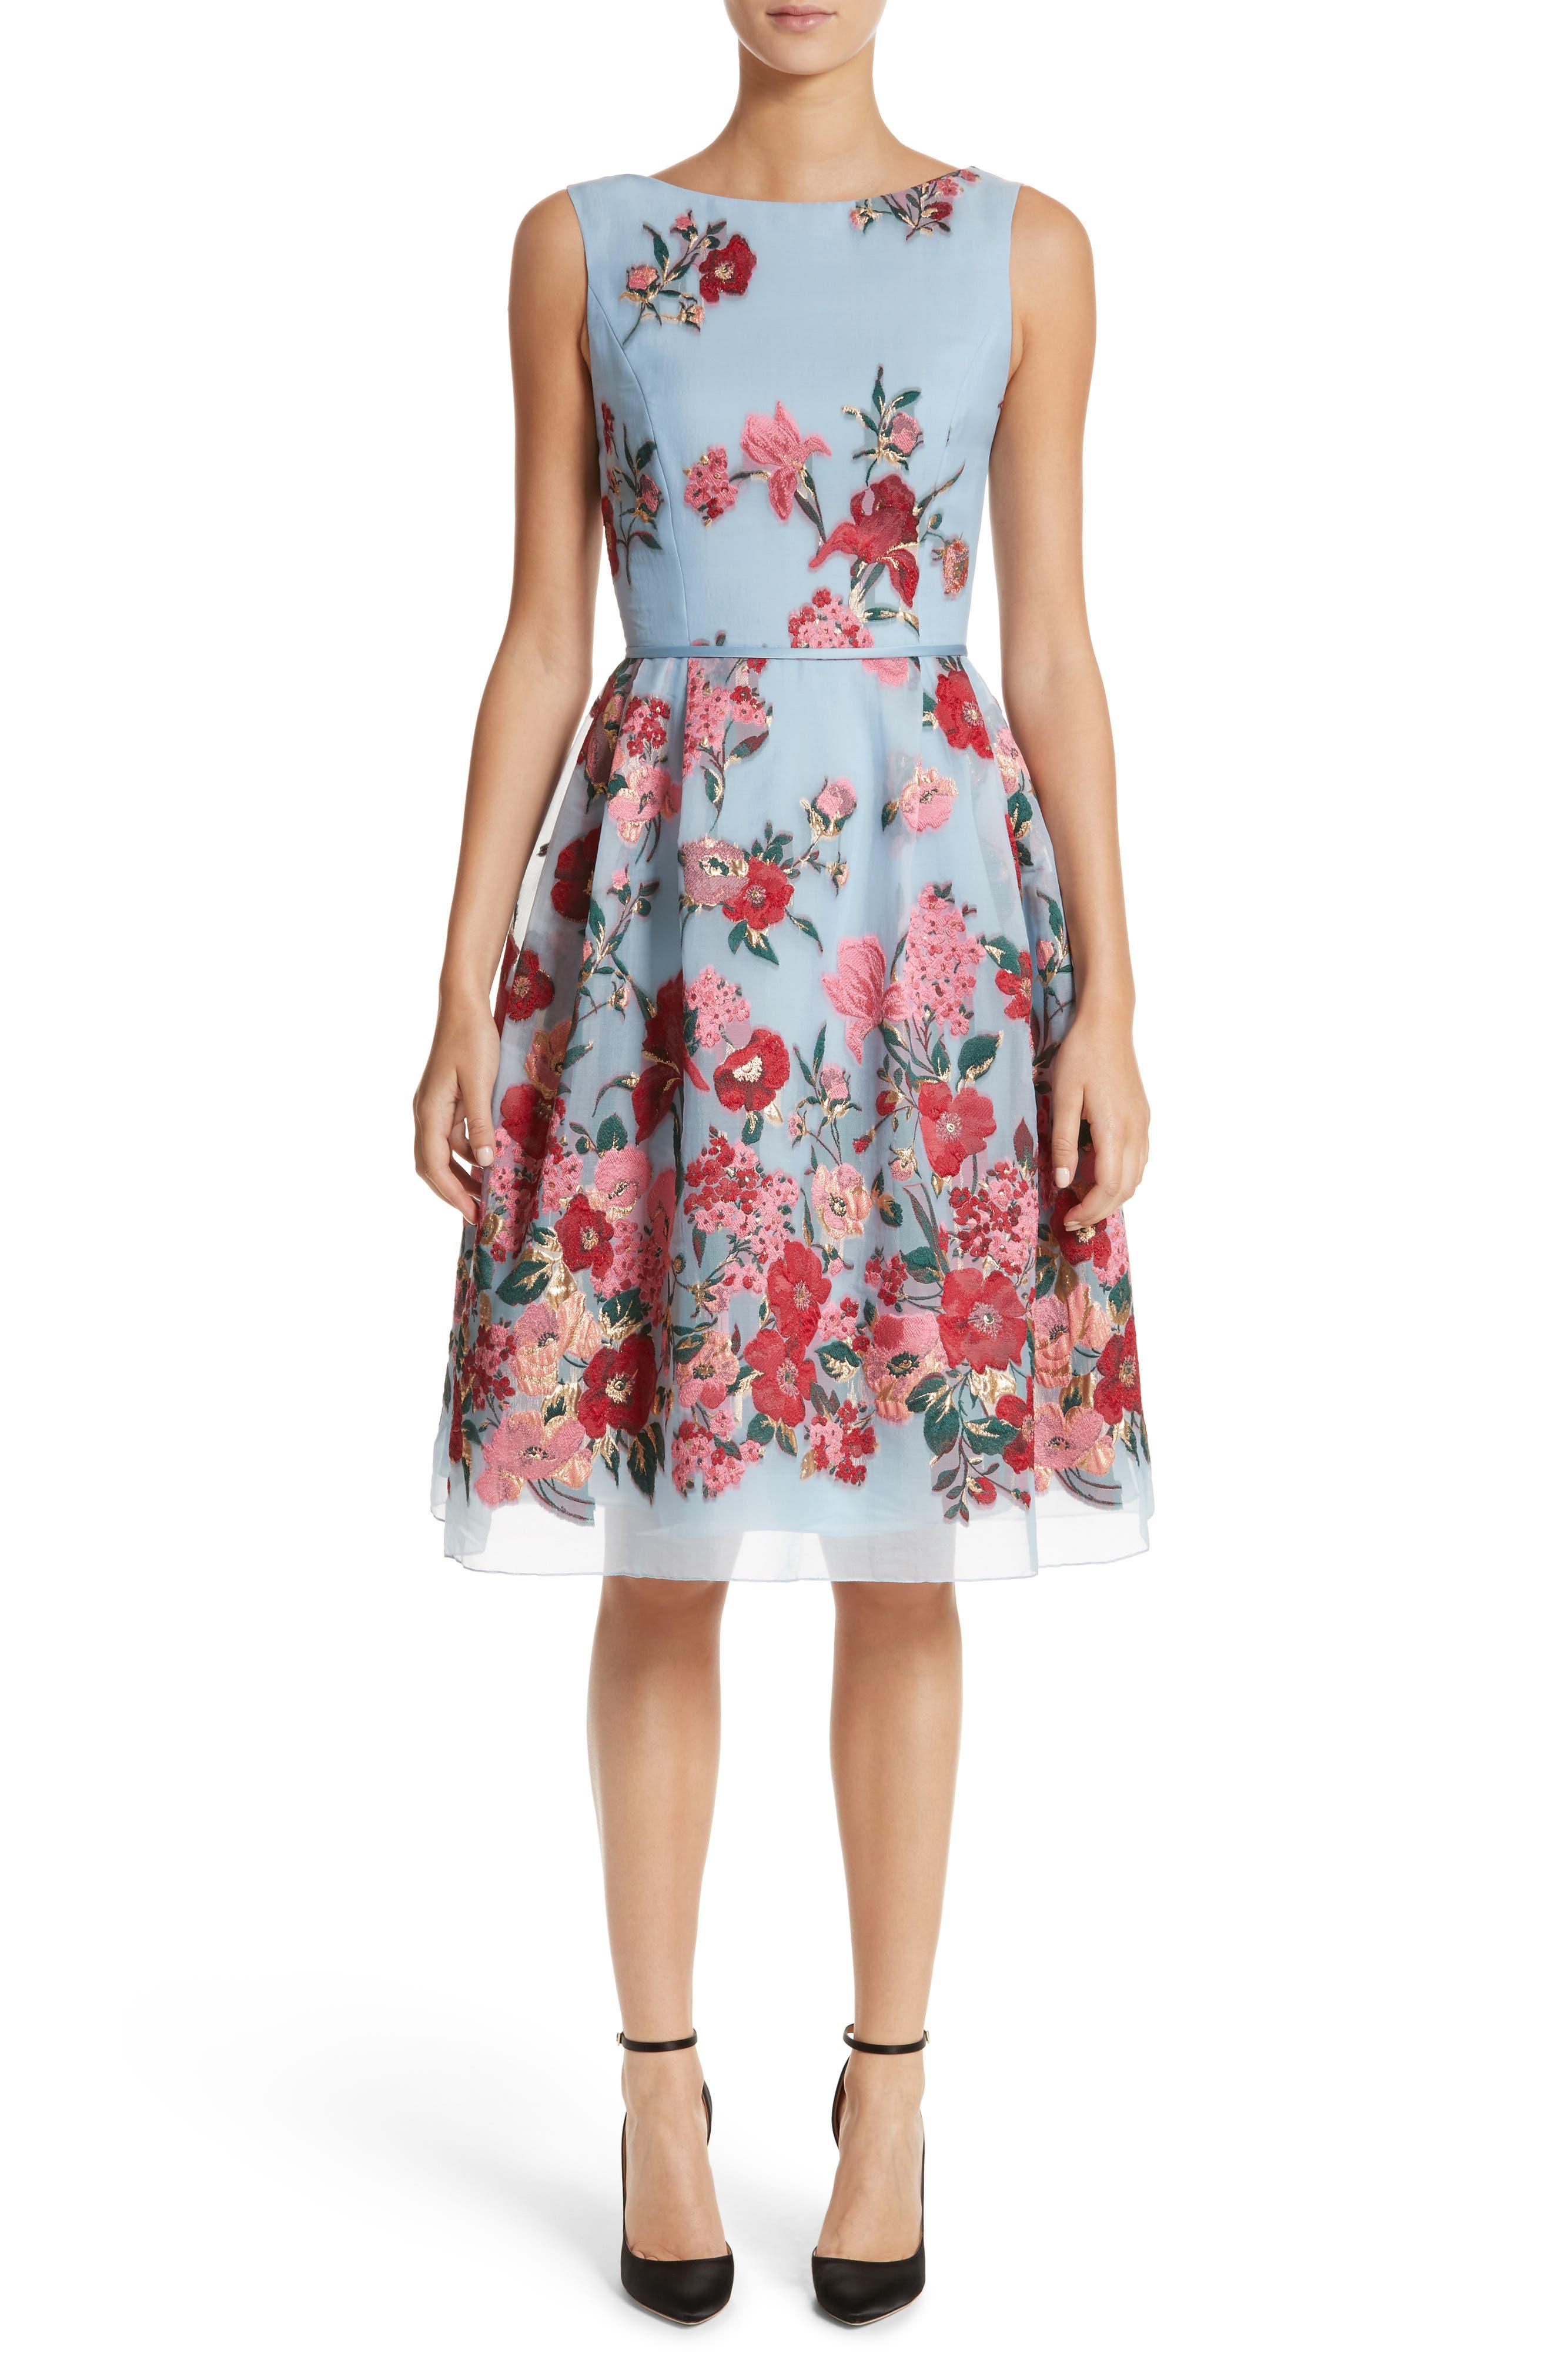 Alternate Image 1 Selected - Carolina Herrera Embroidered Floral Fit & Flare Dress